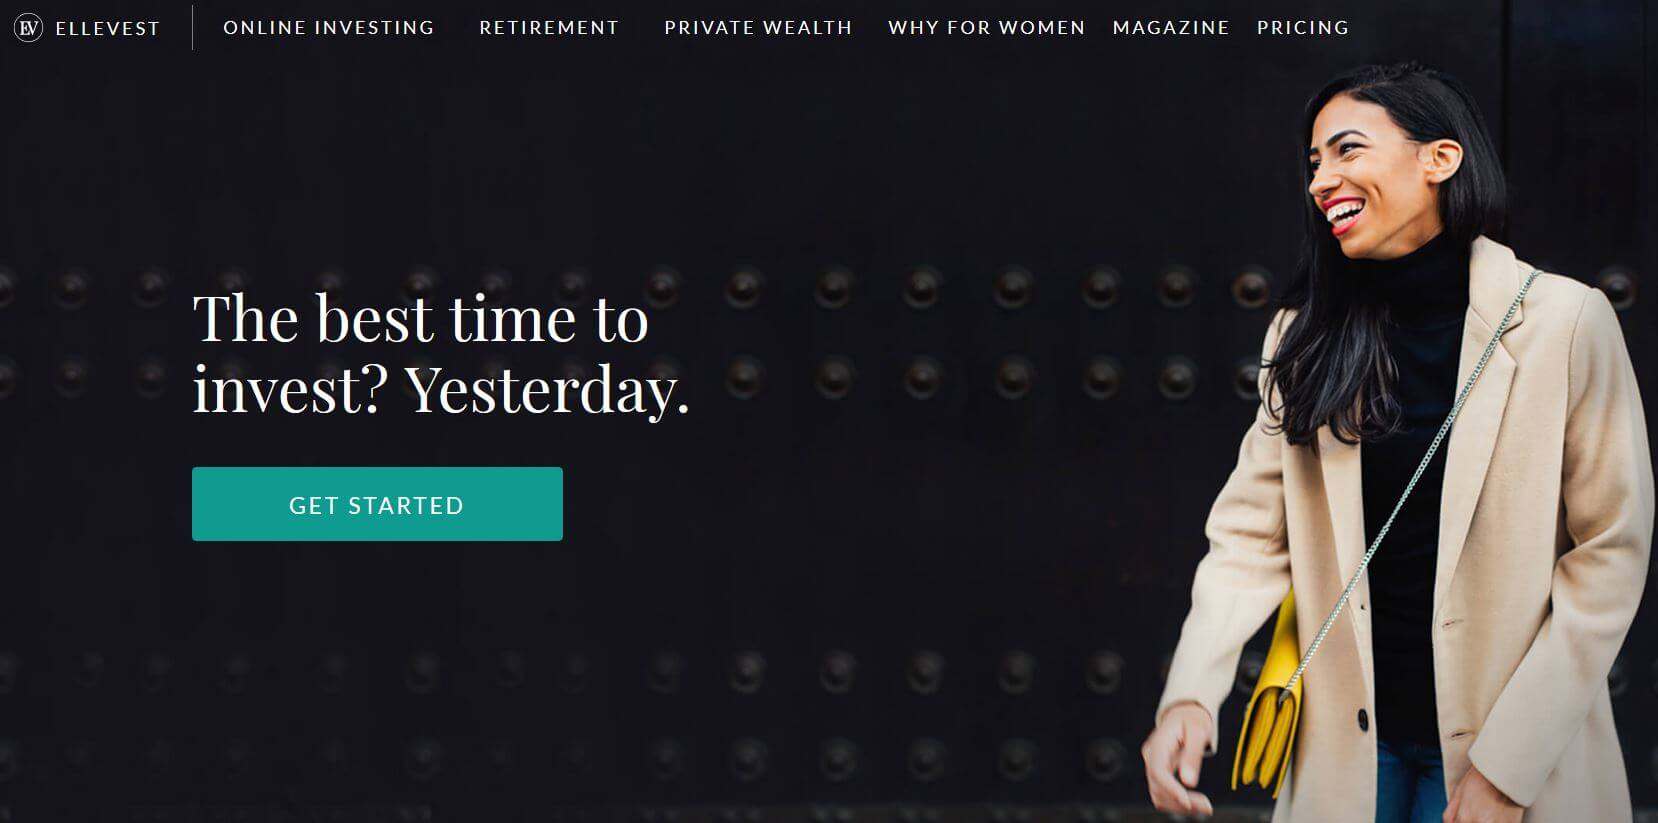 Ellevest | Online-Investing for Women